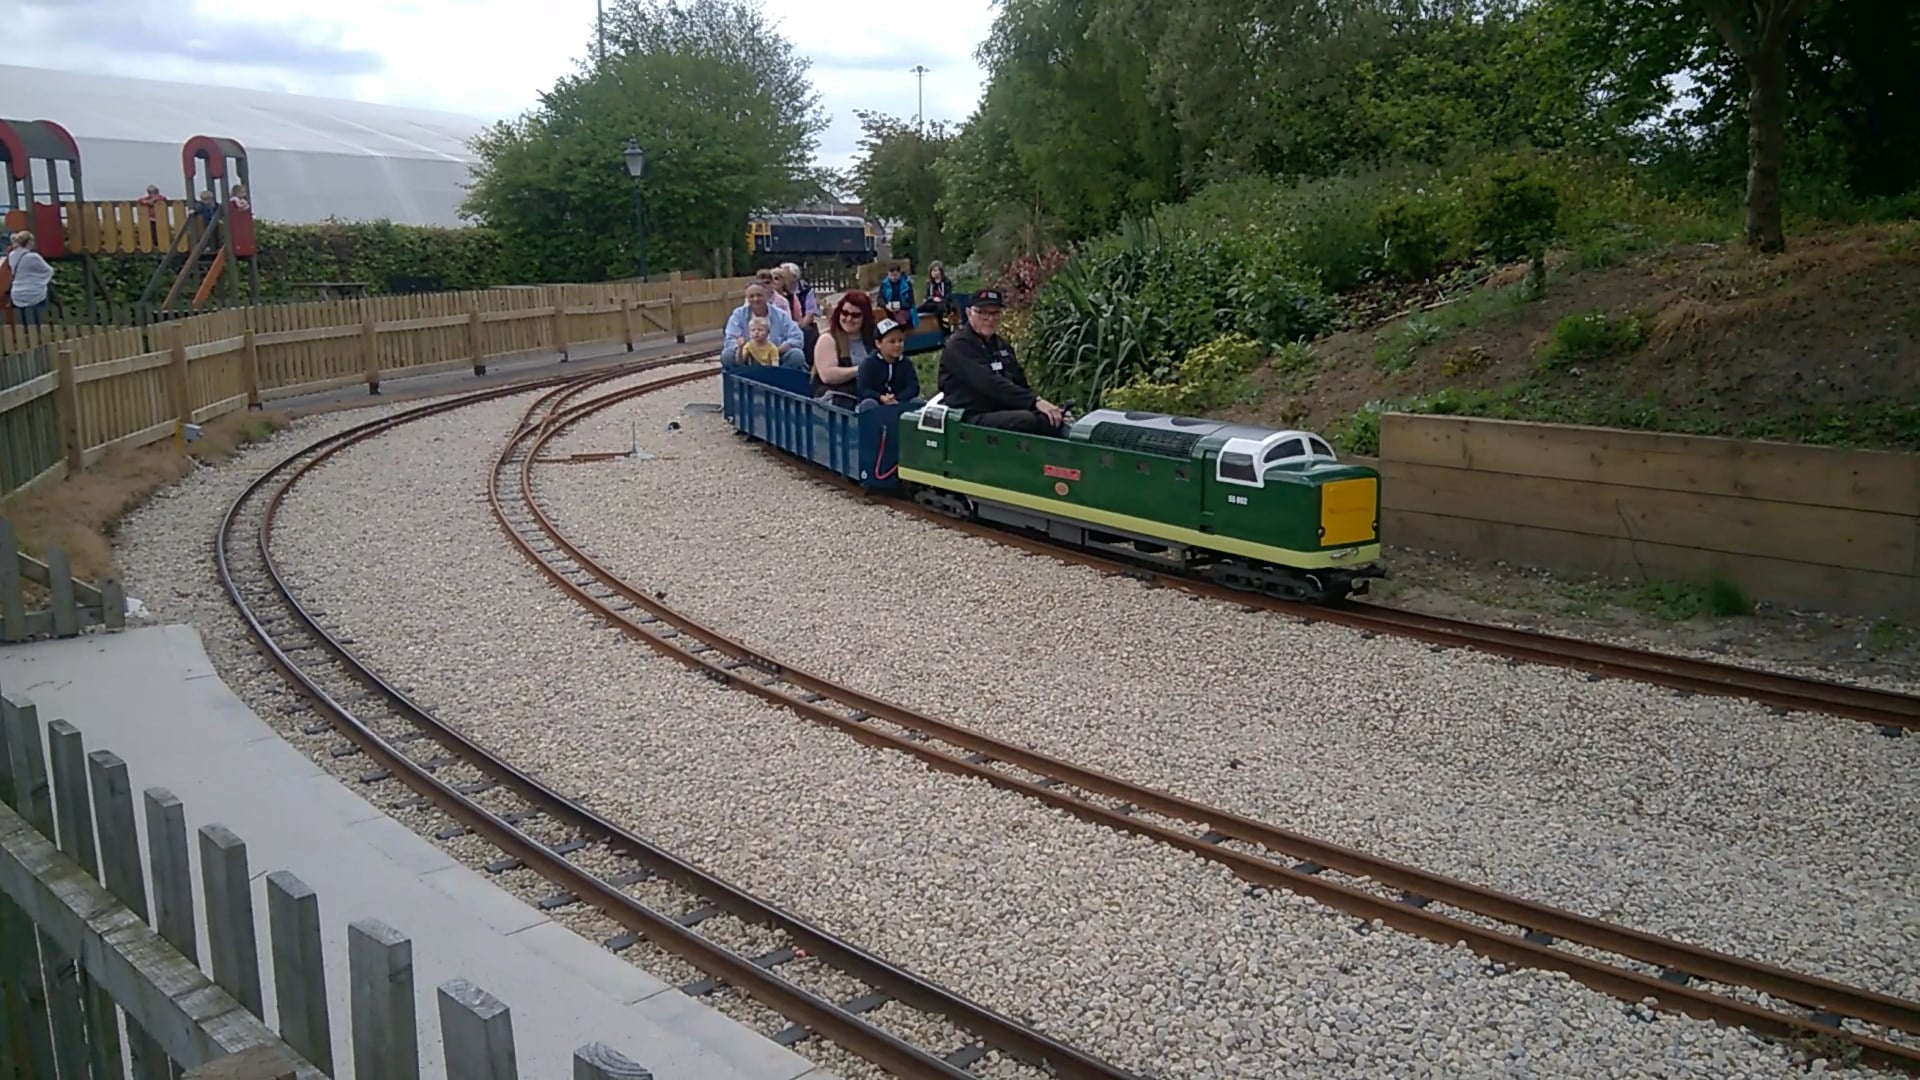 Miniature Railway at National Railway Museum